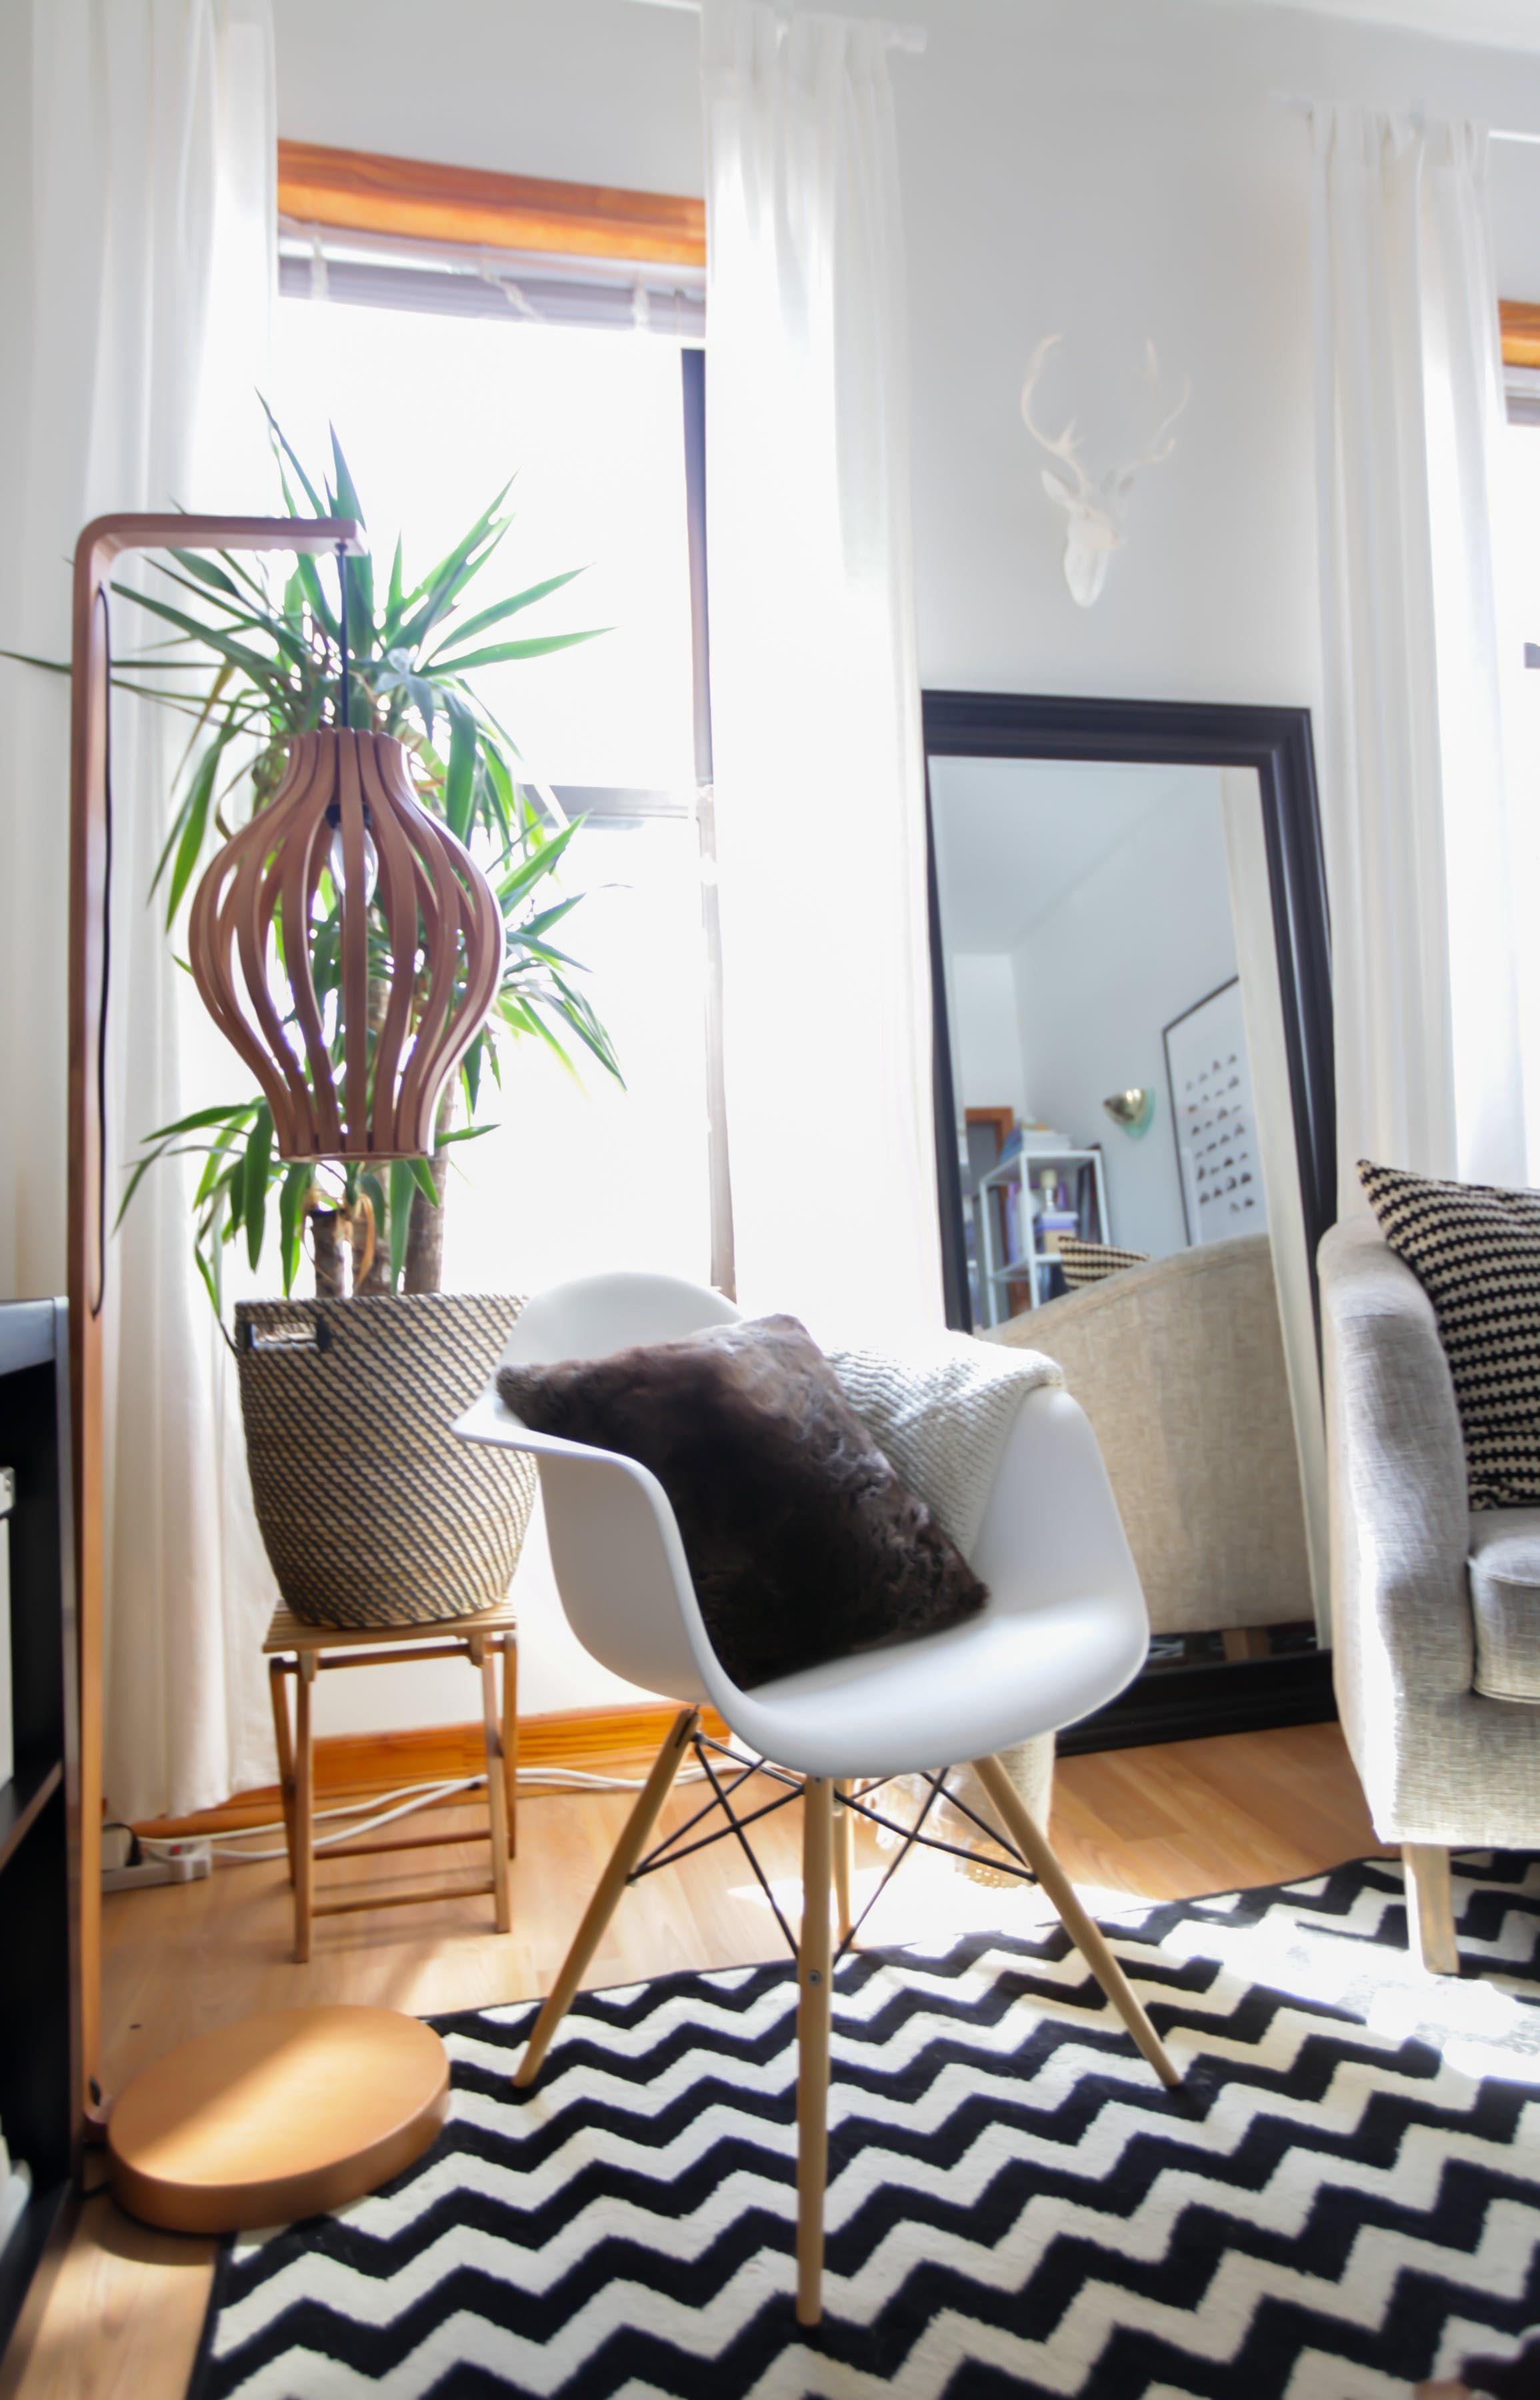 An Avid Craigslister's BlackandWhite Brooklyn Rental Is